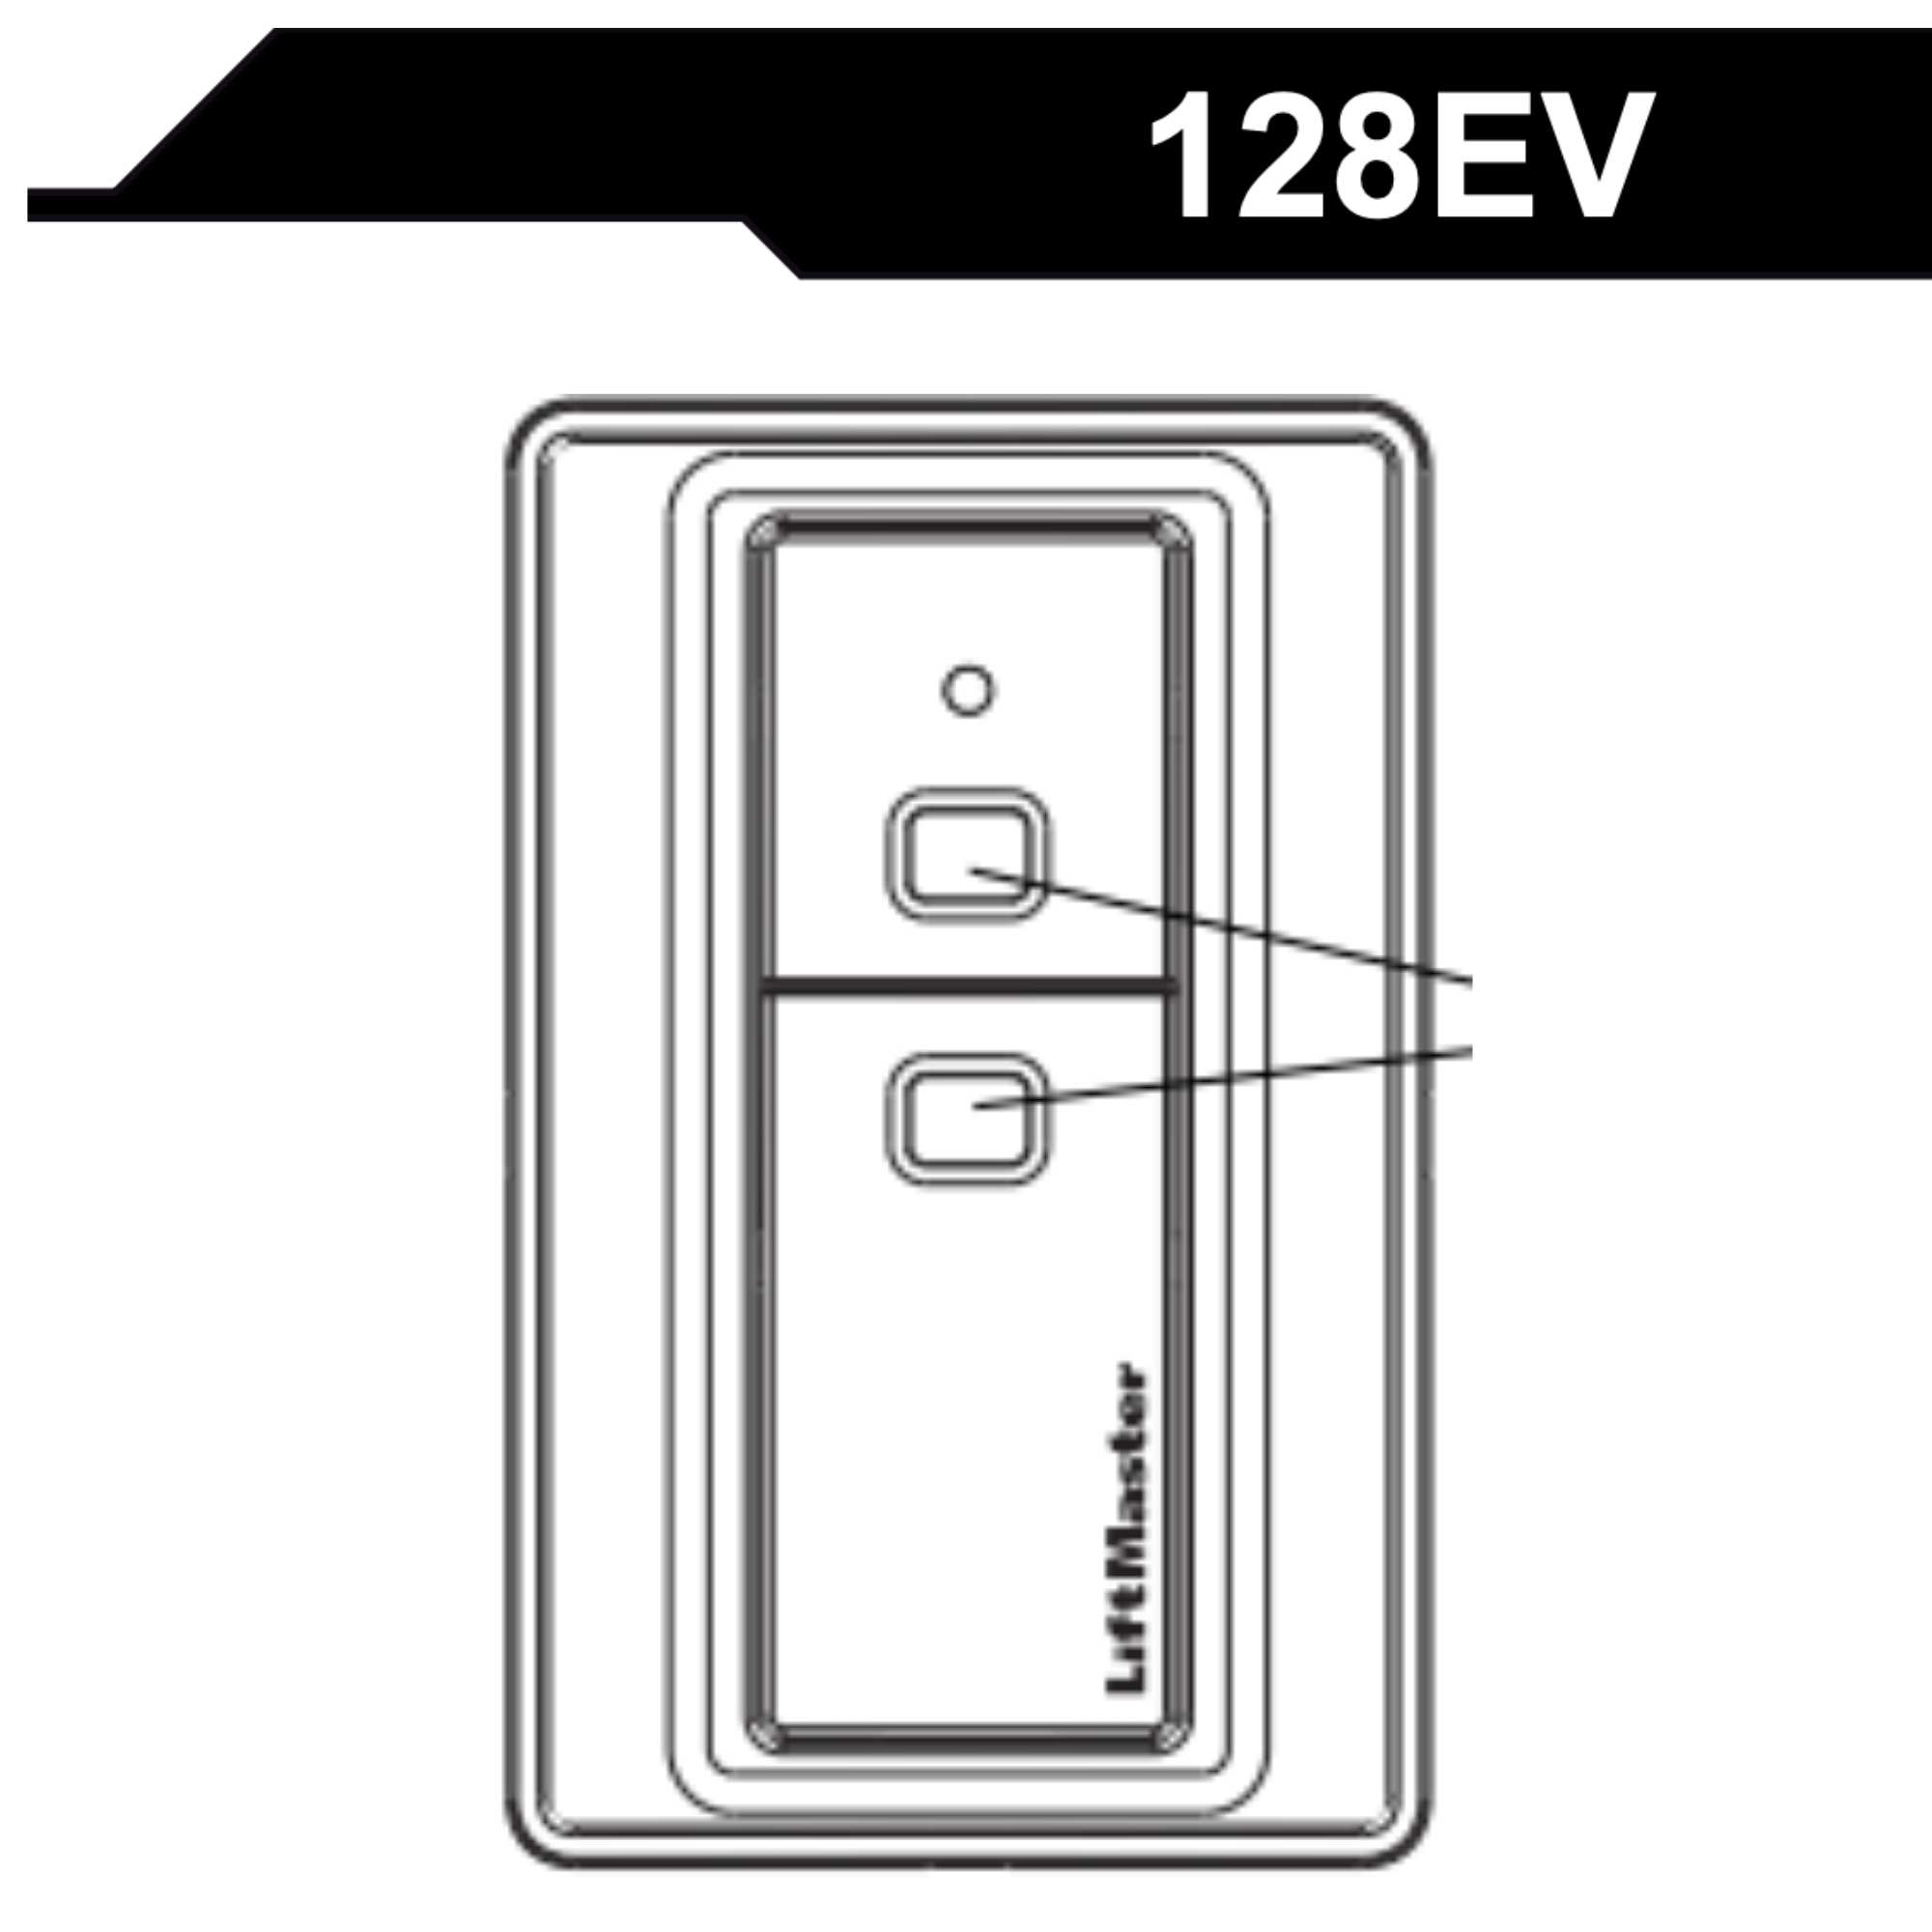 Manual 128EV tråløs veggbryter 2 kanal